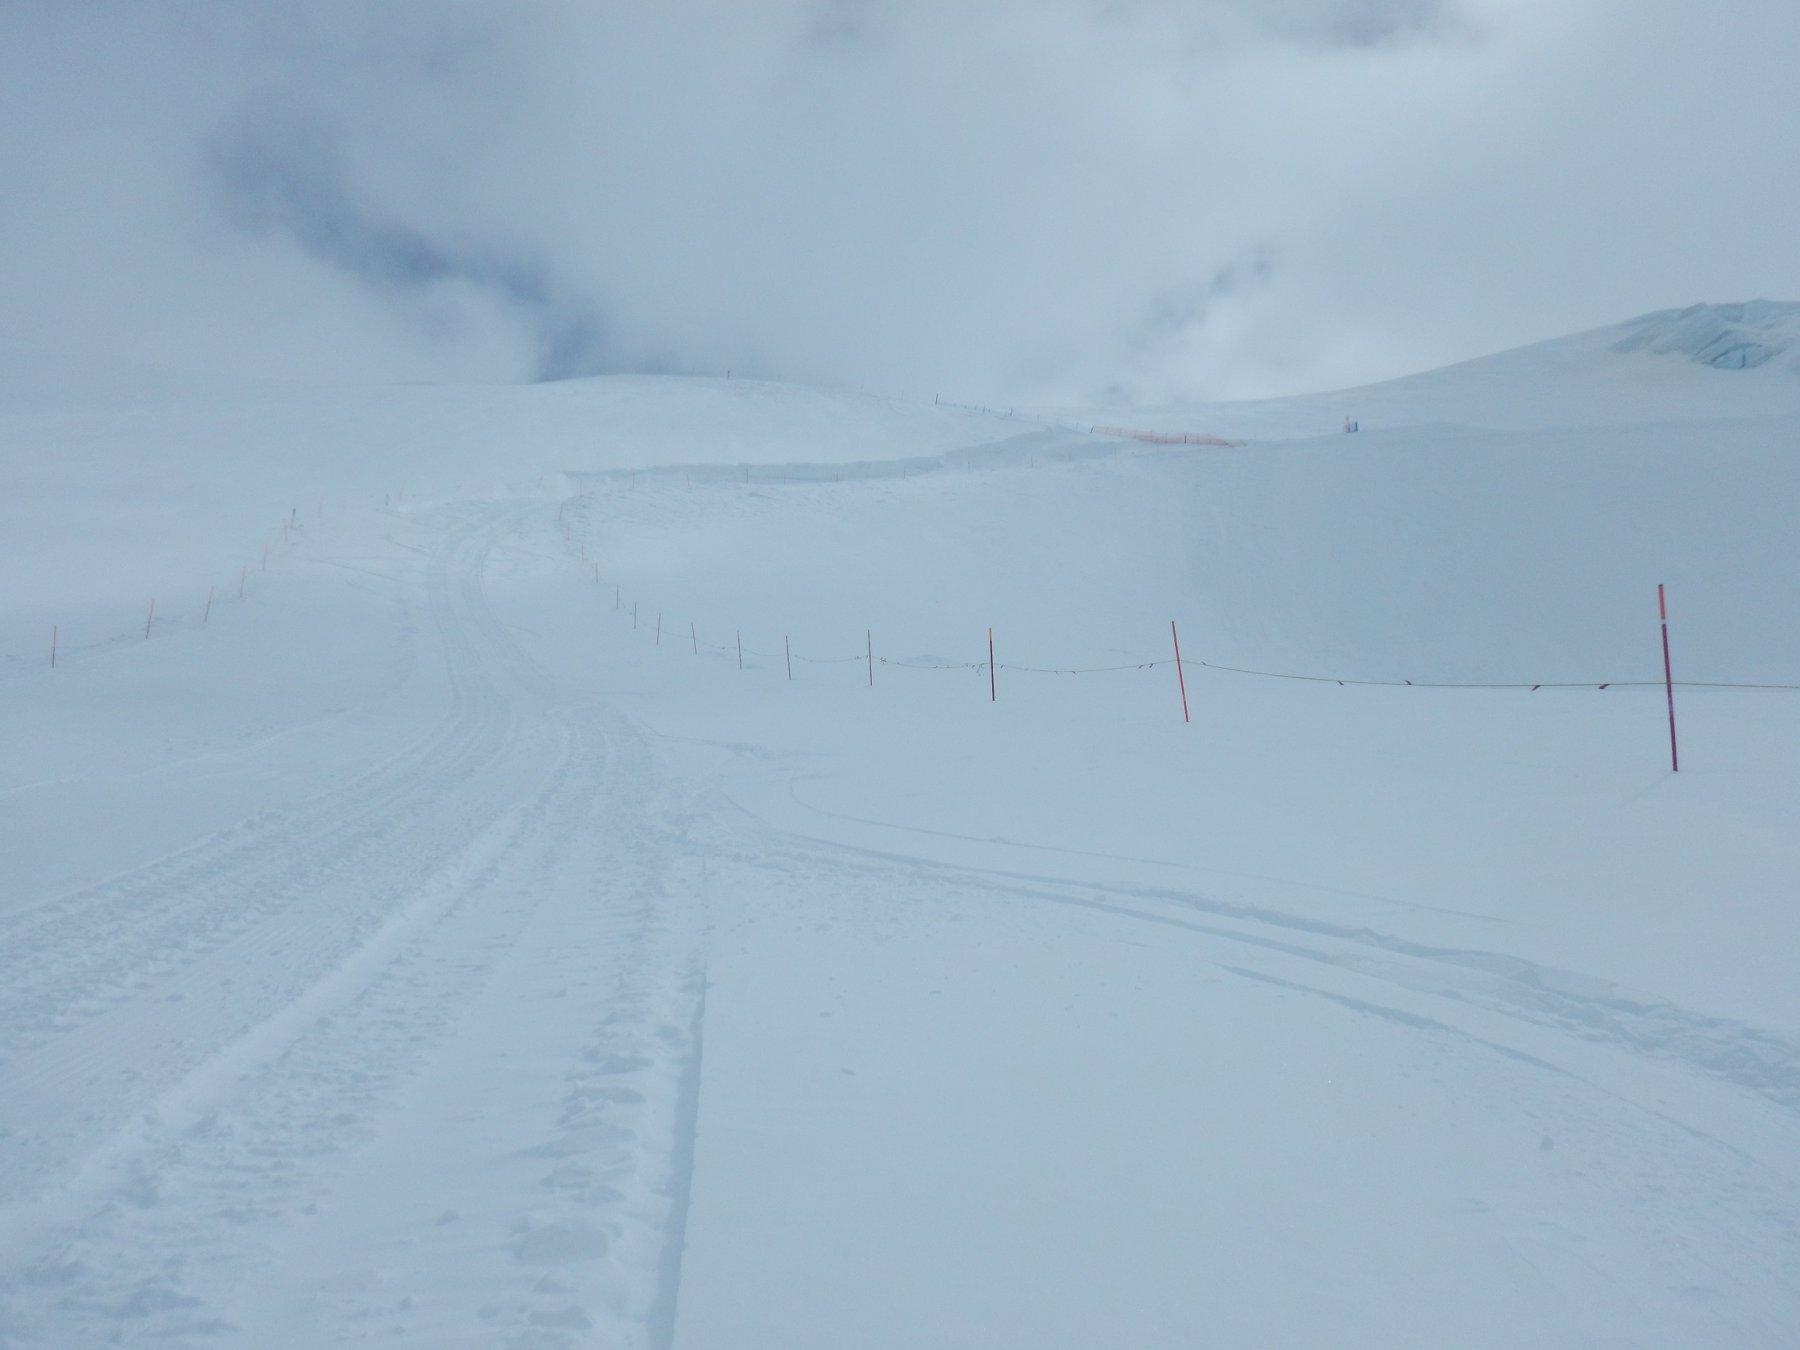 discesa con neve fresca in pista